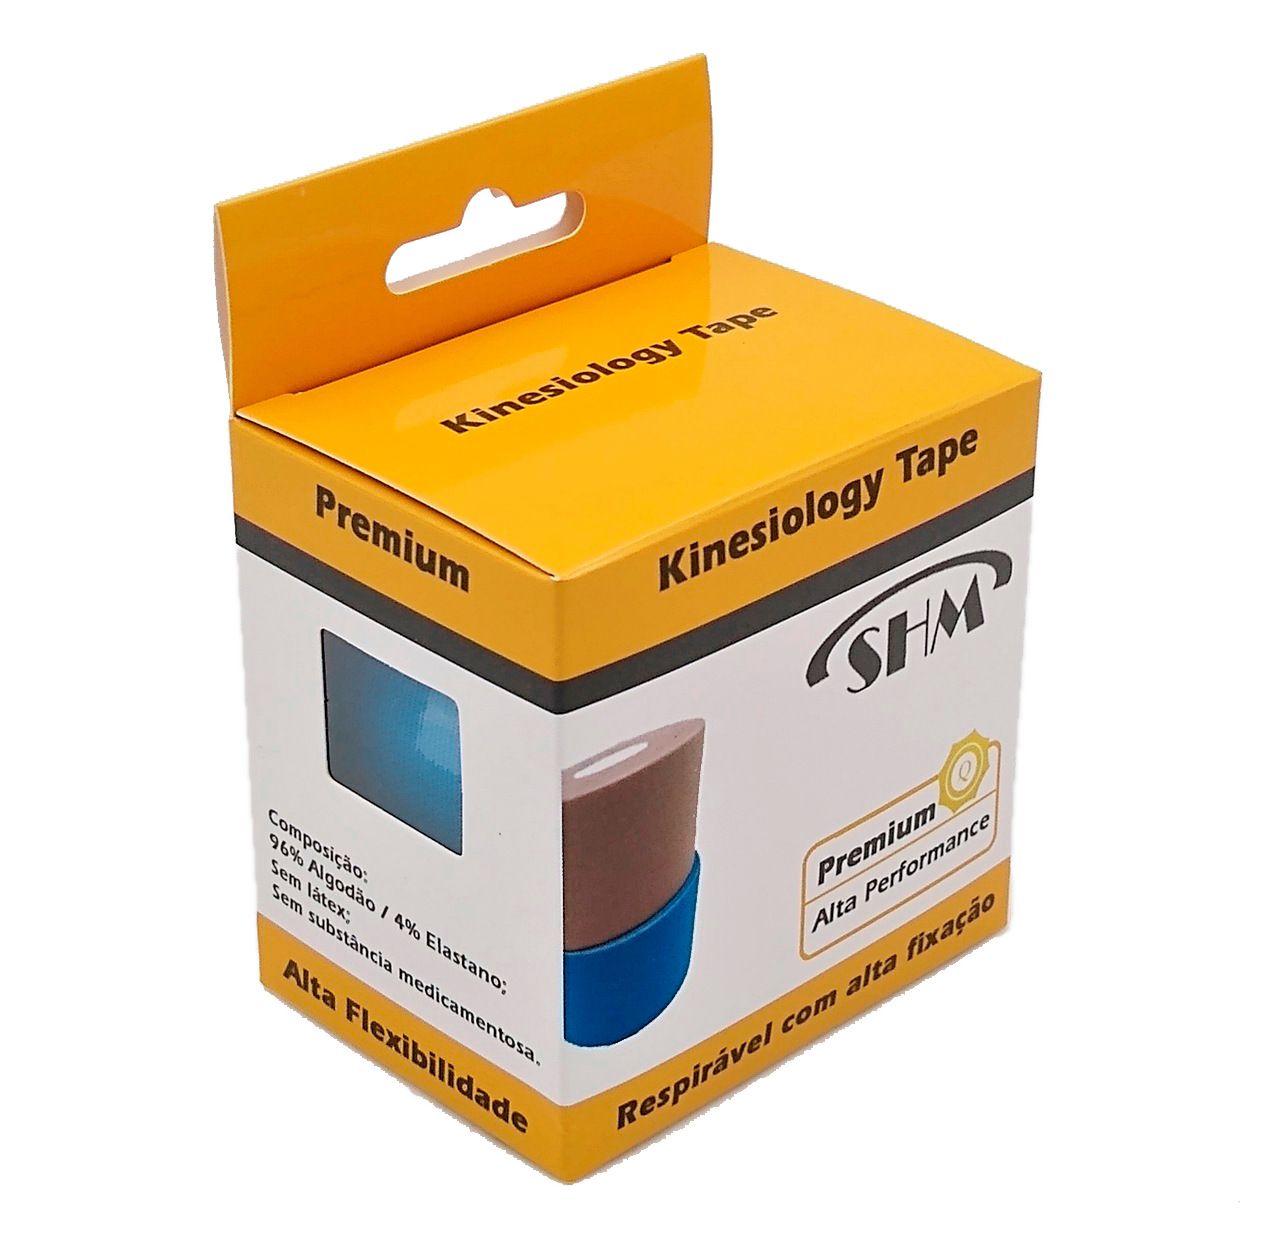 Kinesio Tape Shm Premium - Alta Performance